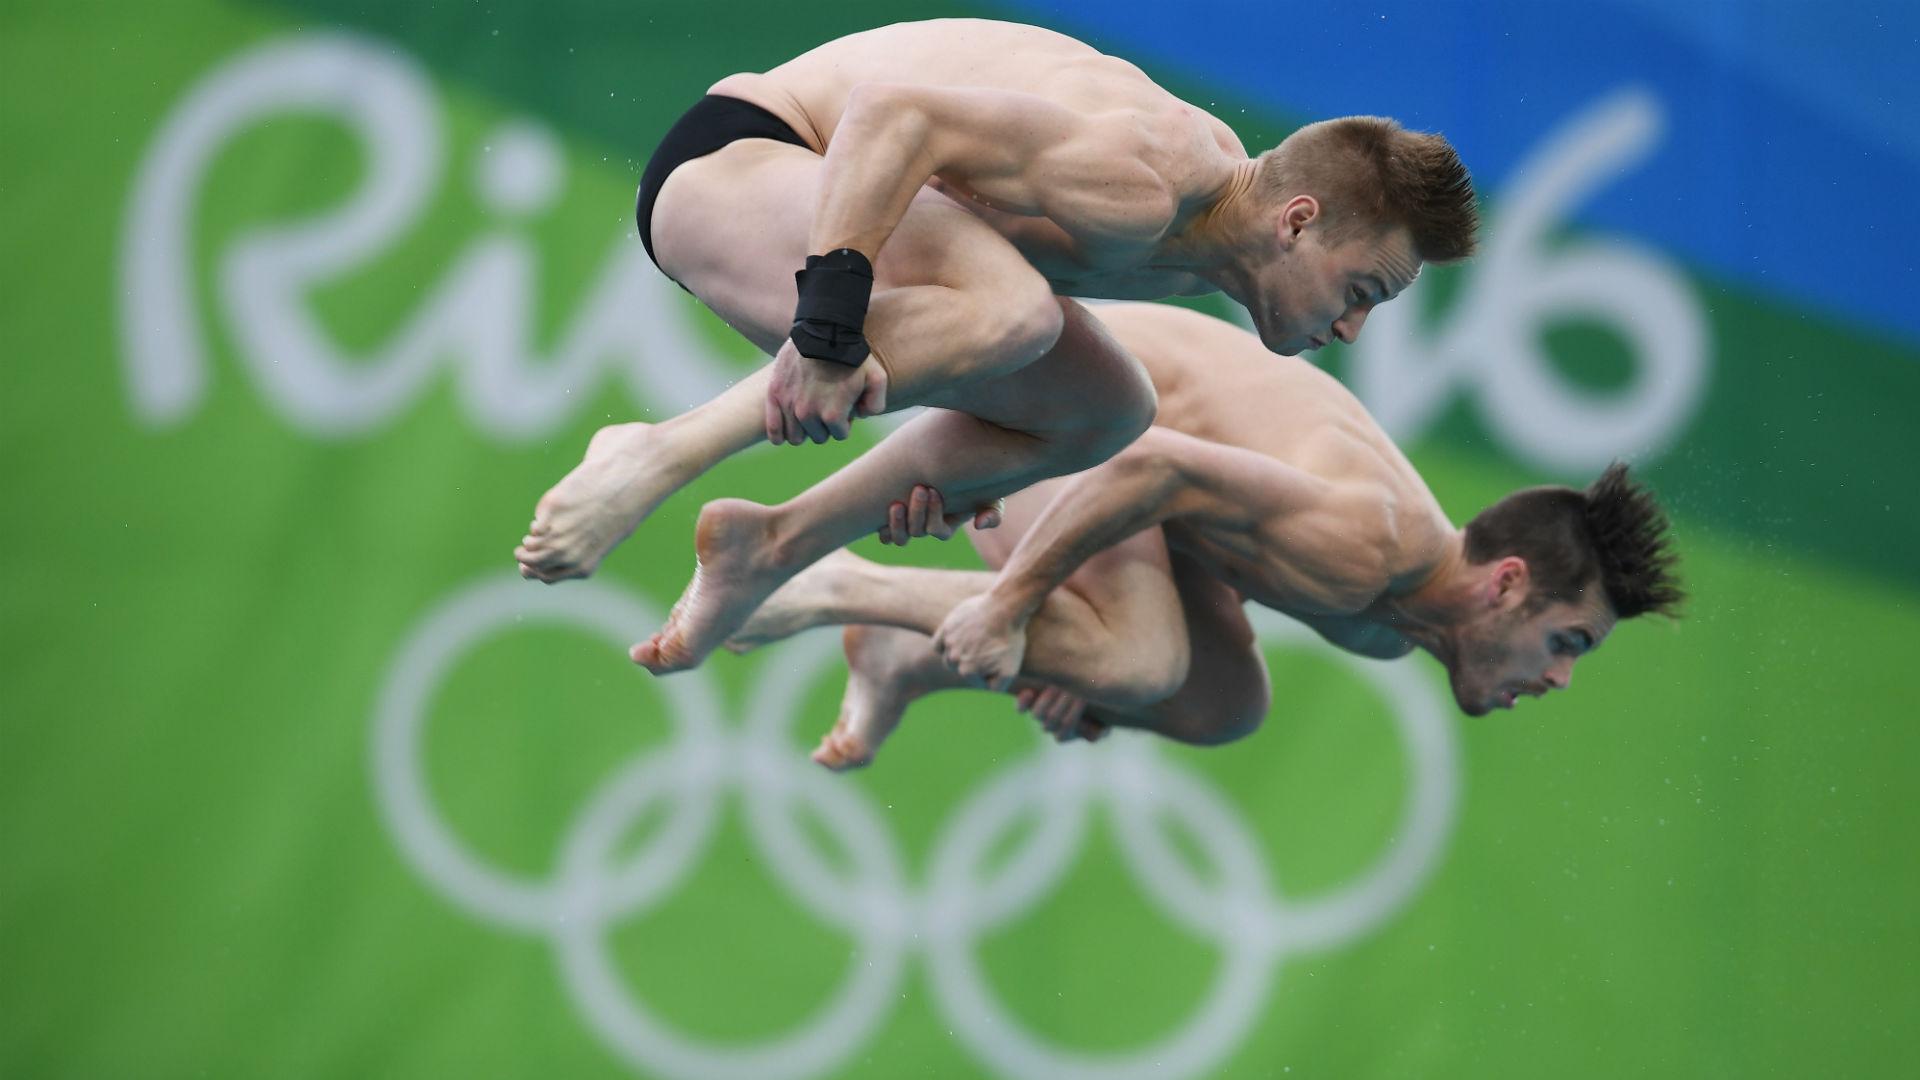 Men's Gymnastics All-Around - Rio Summer Olympics Odds 8/6/16